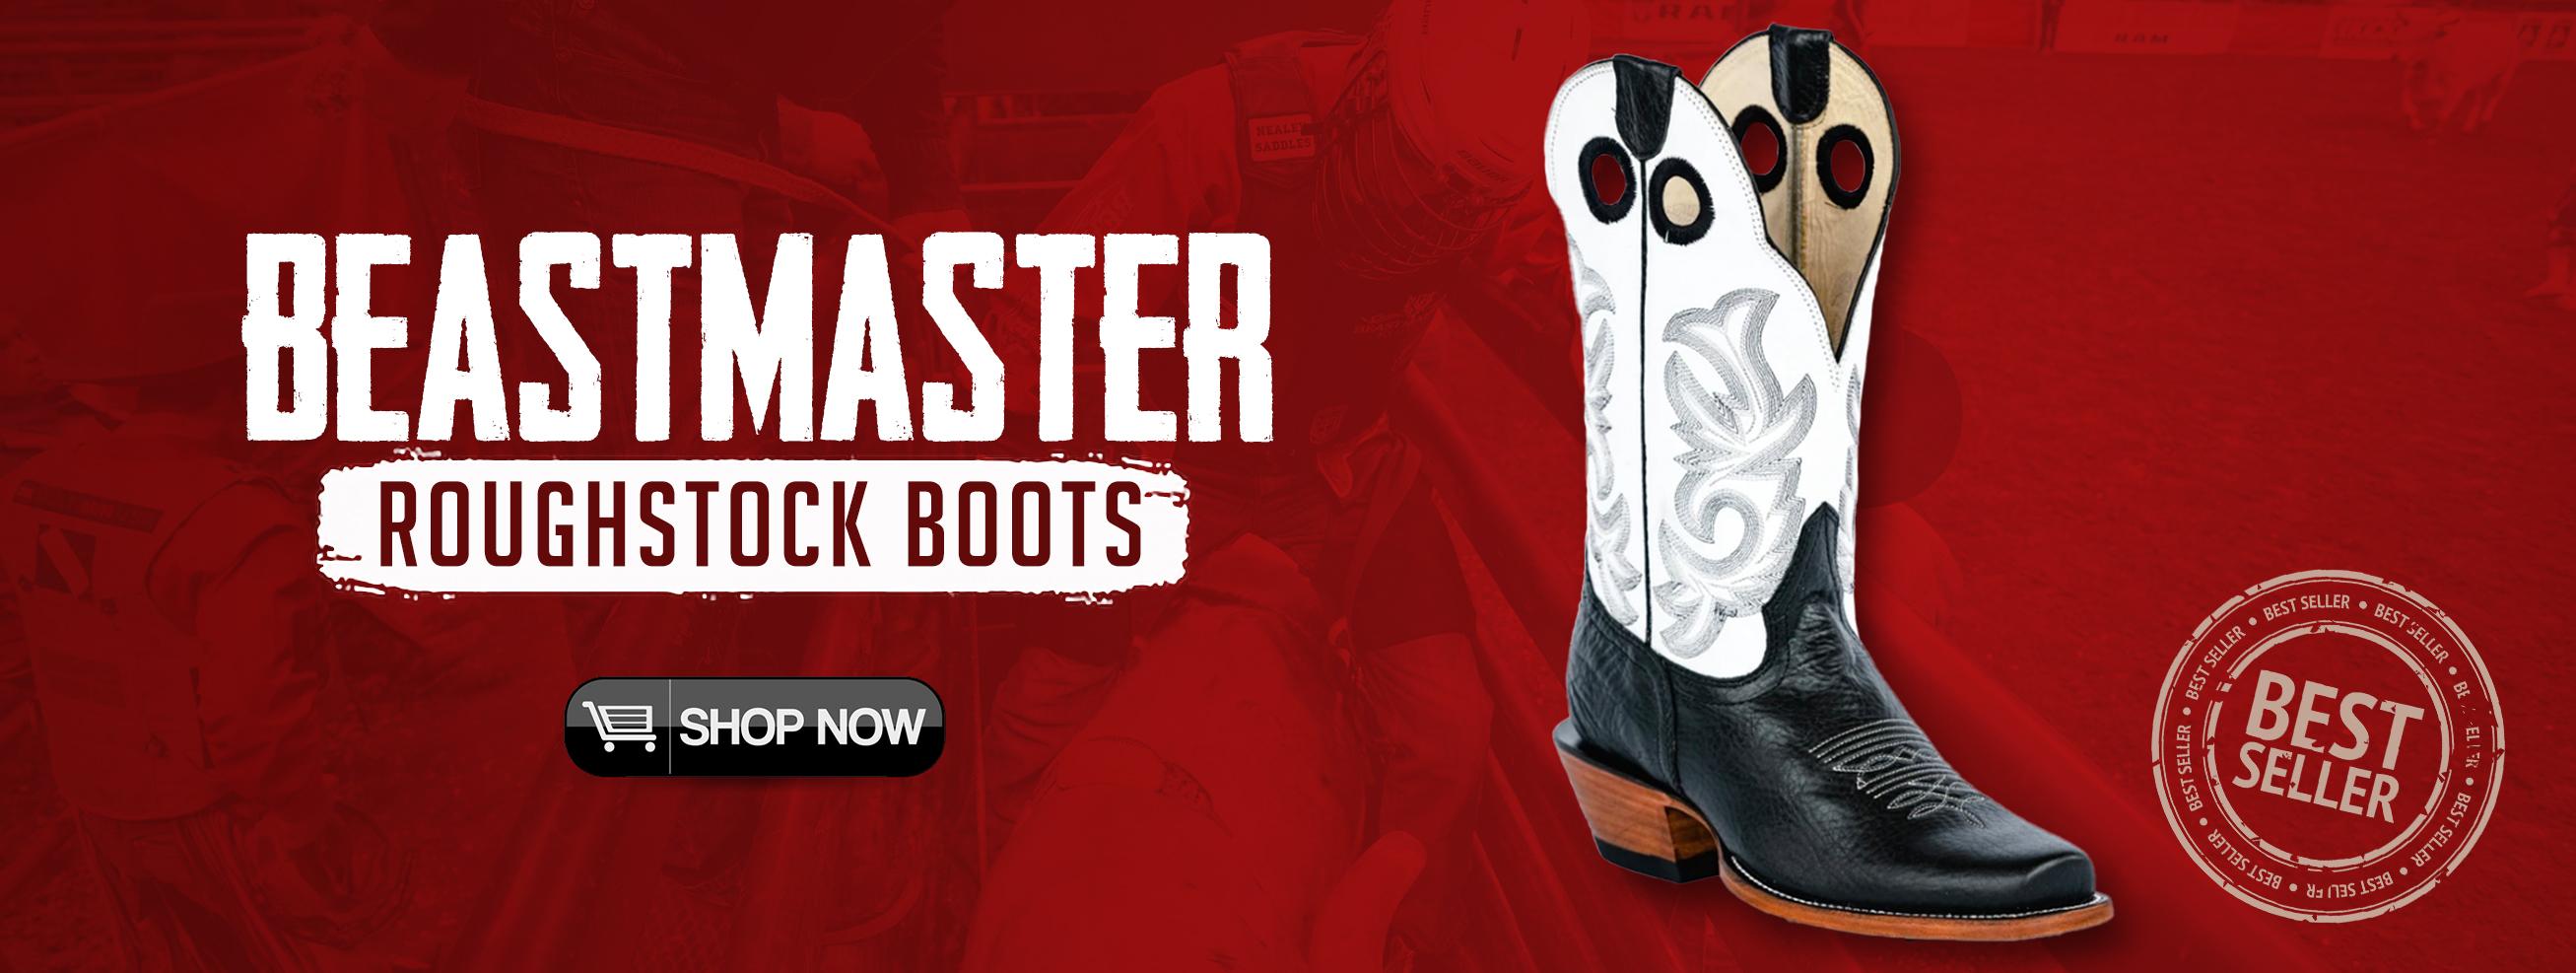 Shop Beastmaster Roughstock Boots